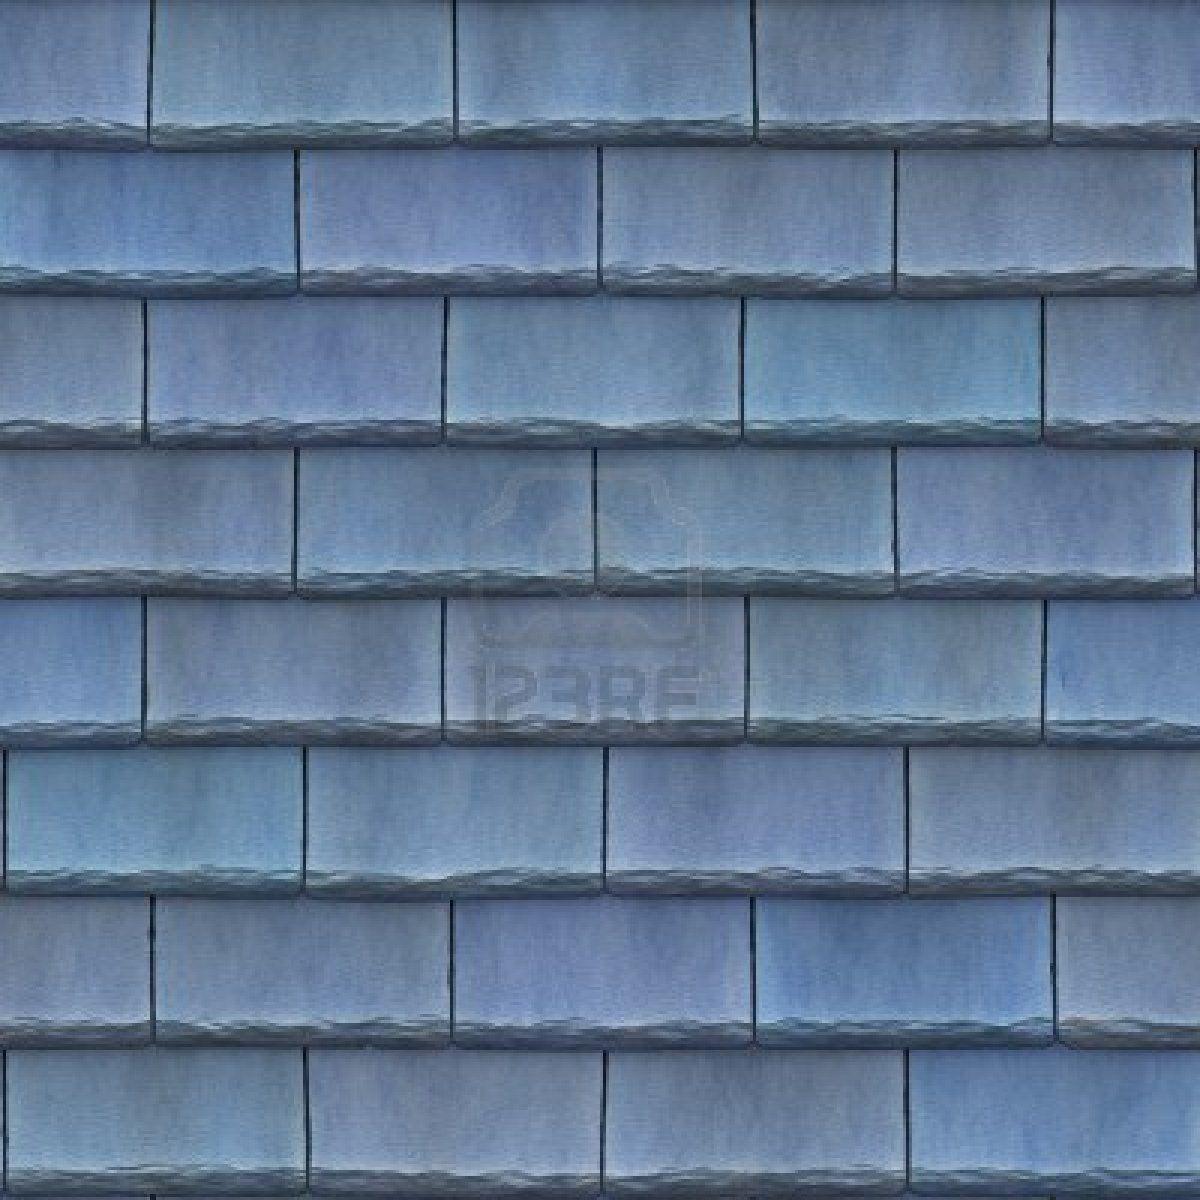 Concrete Tile Roof Seamless Concrete Shingle HOME